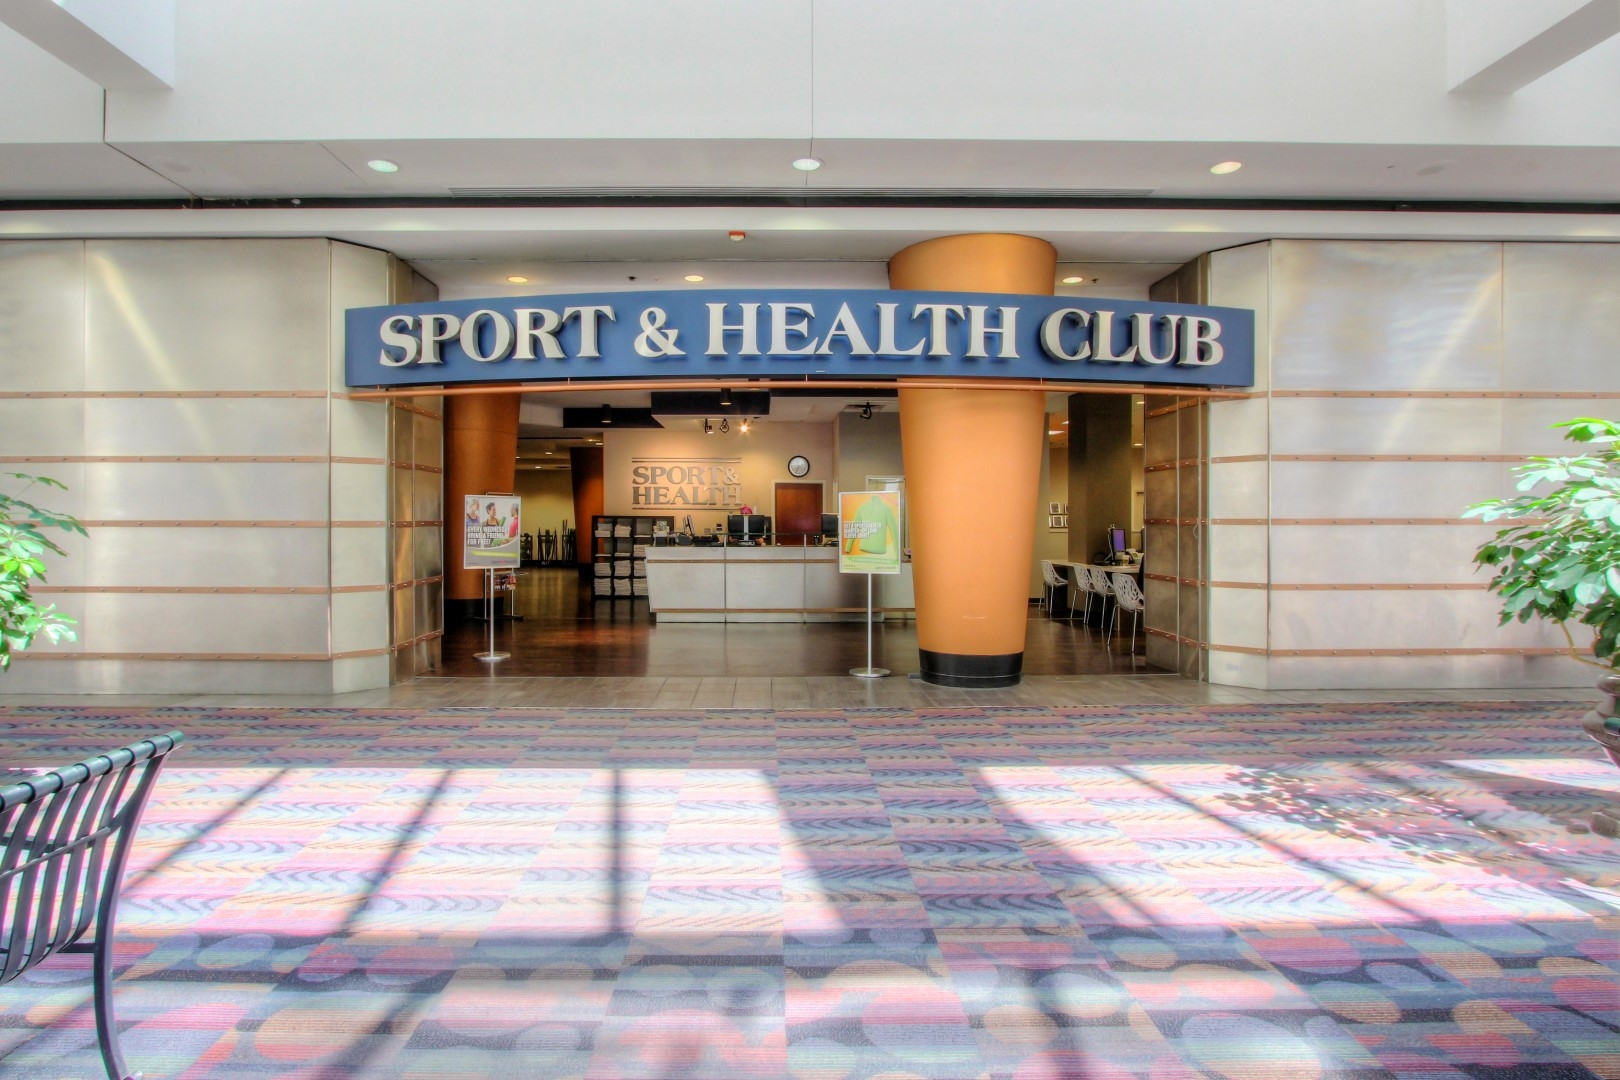 ballston sport&health, arlington virginia (va) - localdatabase